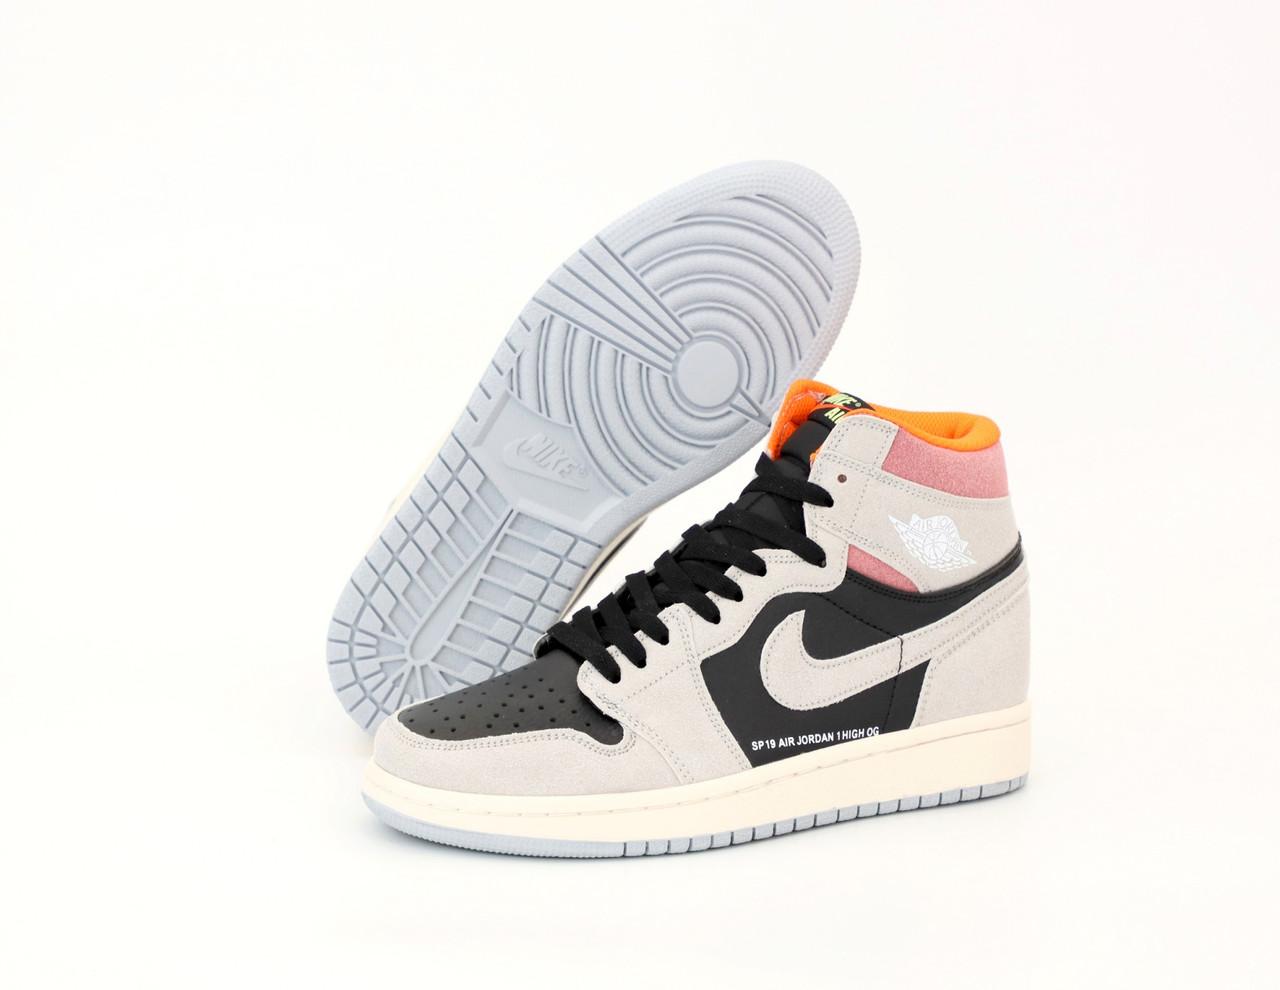 Мужские кроссовки Nike Air Jordan. White Black. ТОП Реплика ААА класса.